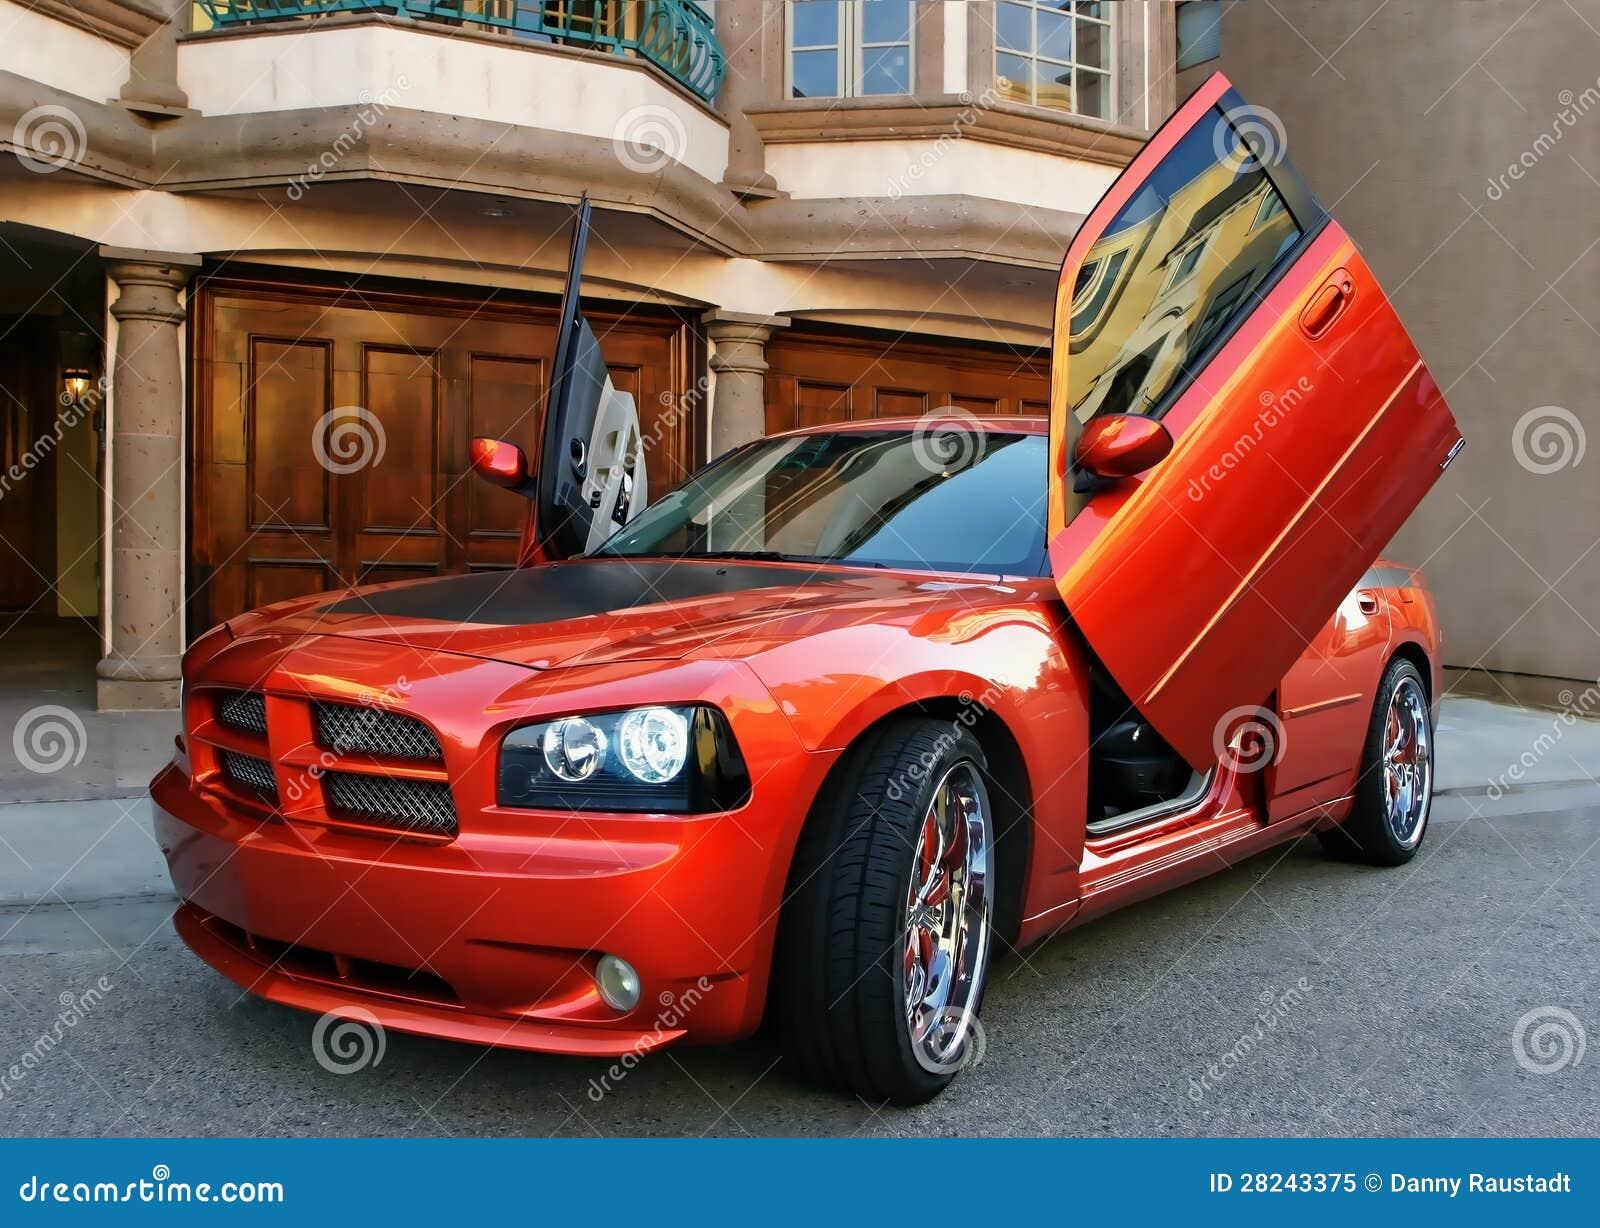 voiture de sport am ricaine rouge image stock image du. Black Bedroom Furniture Sets. Home Design Ideas